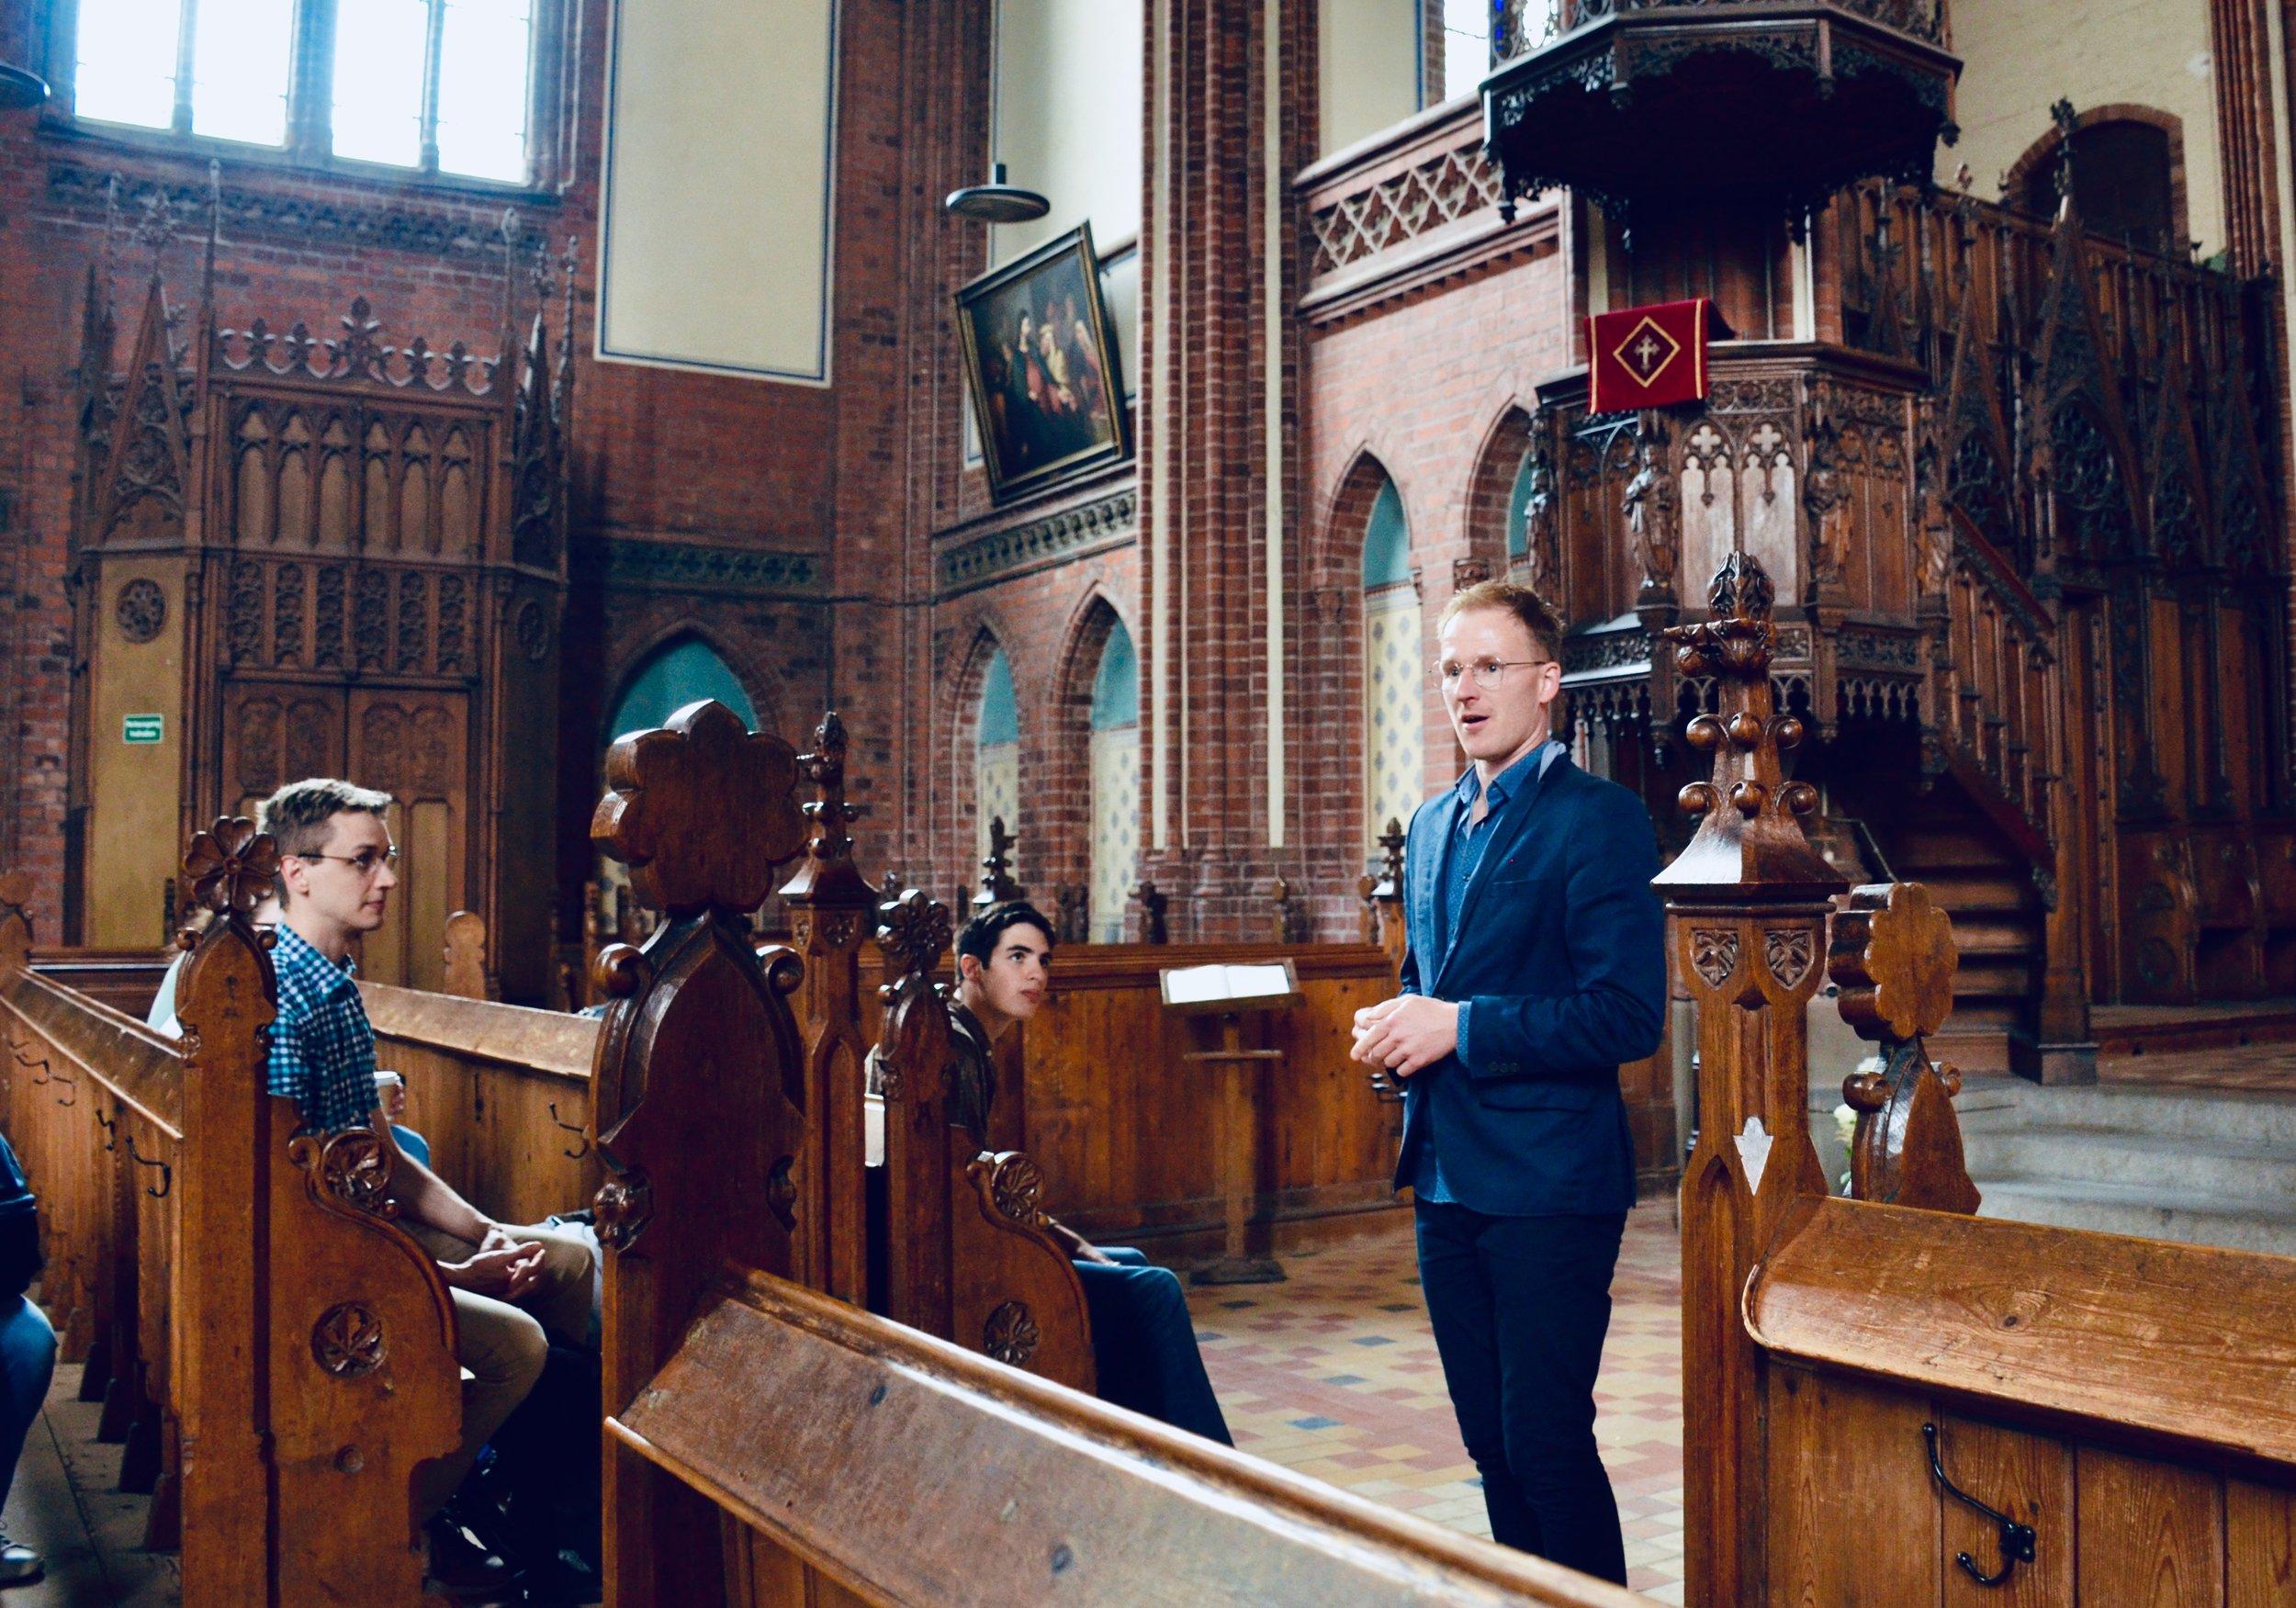 Christian Domke introduces the 1869 Friese organ, Paulskirche, Schwerin. Boston Organ Studio.